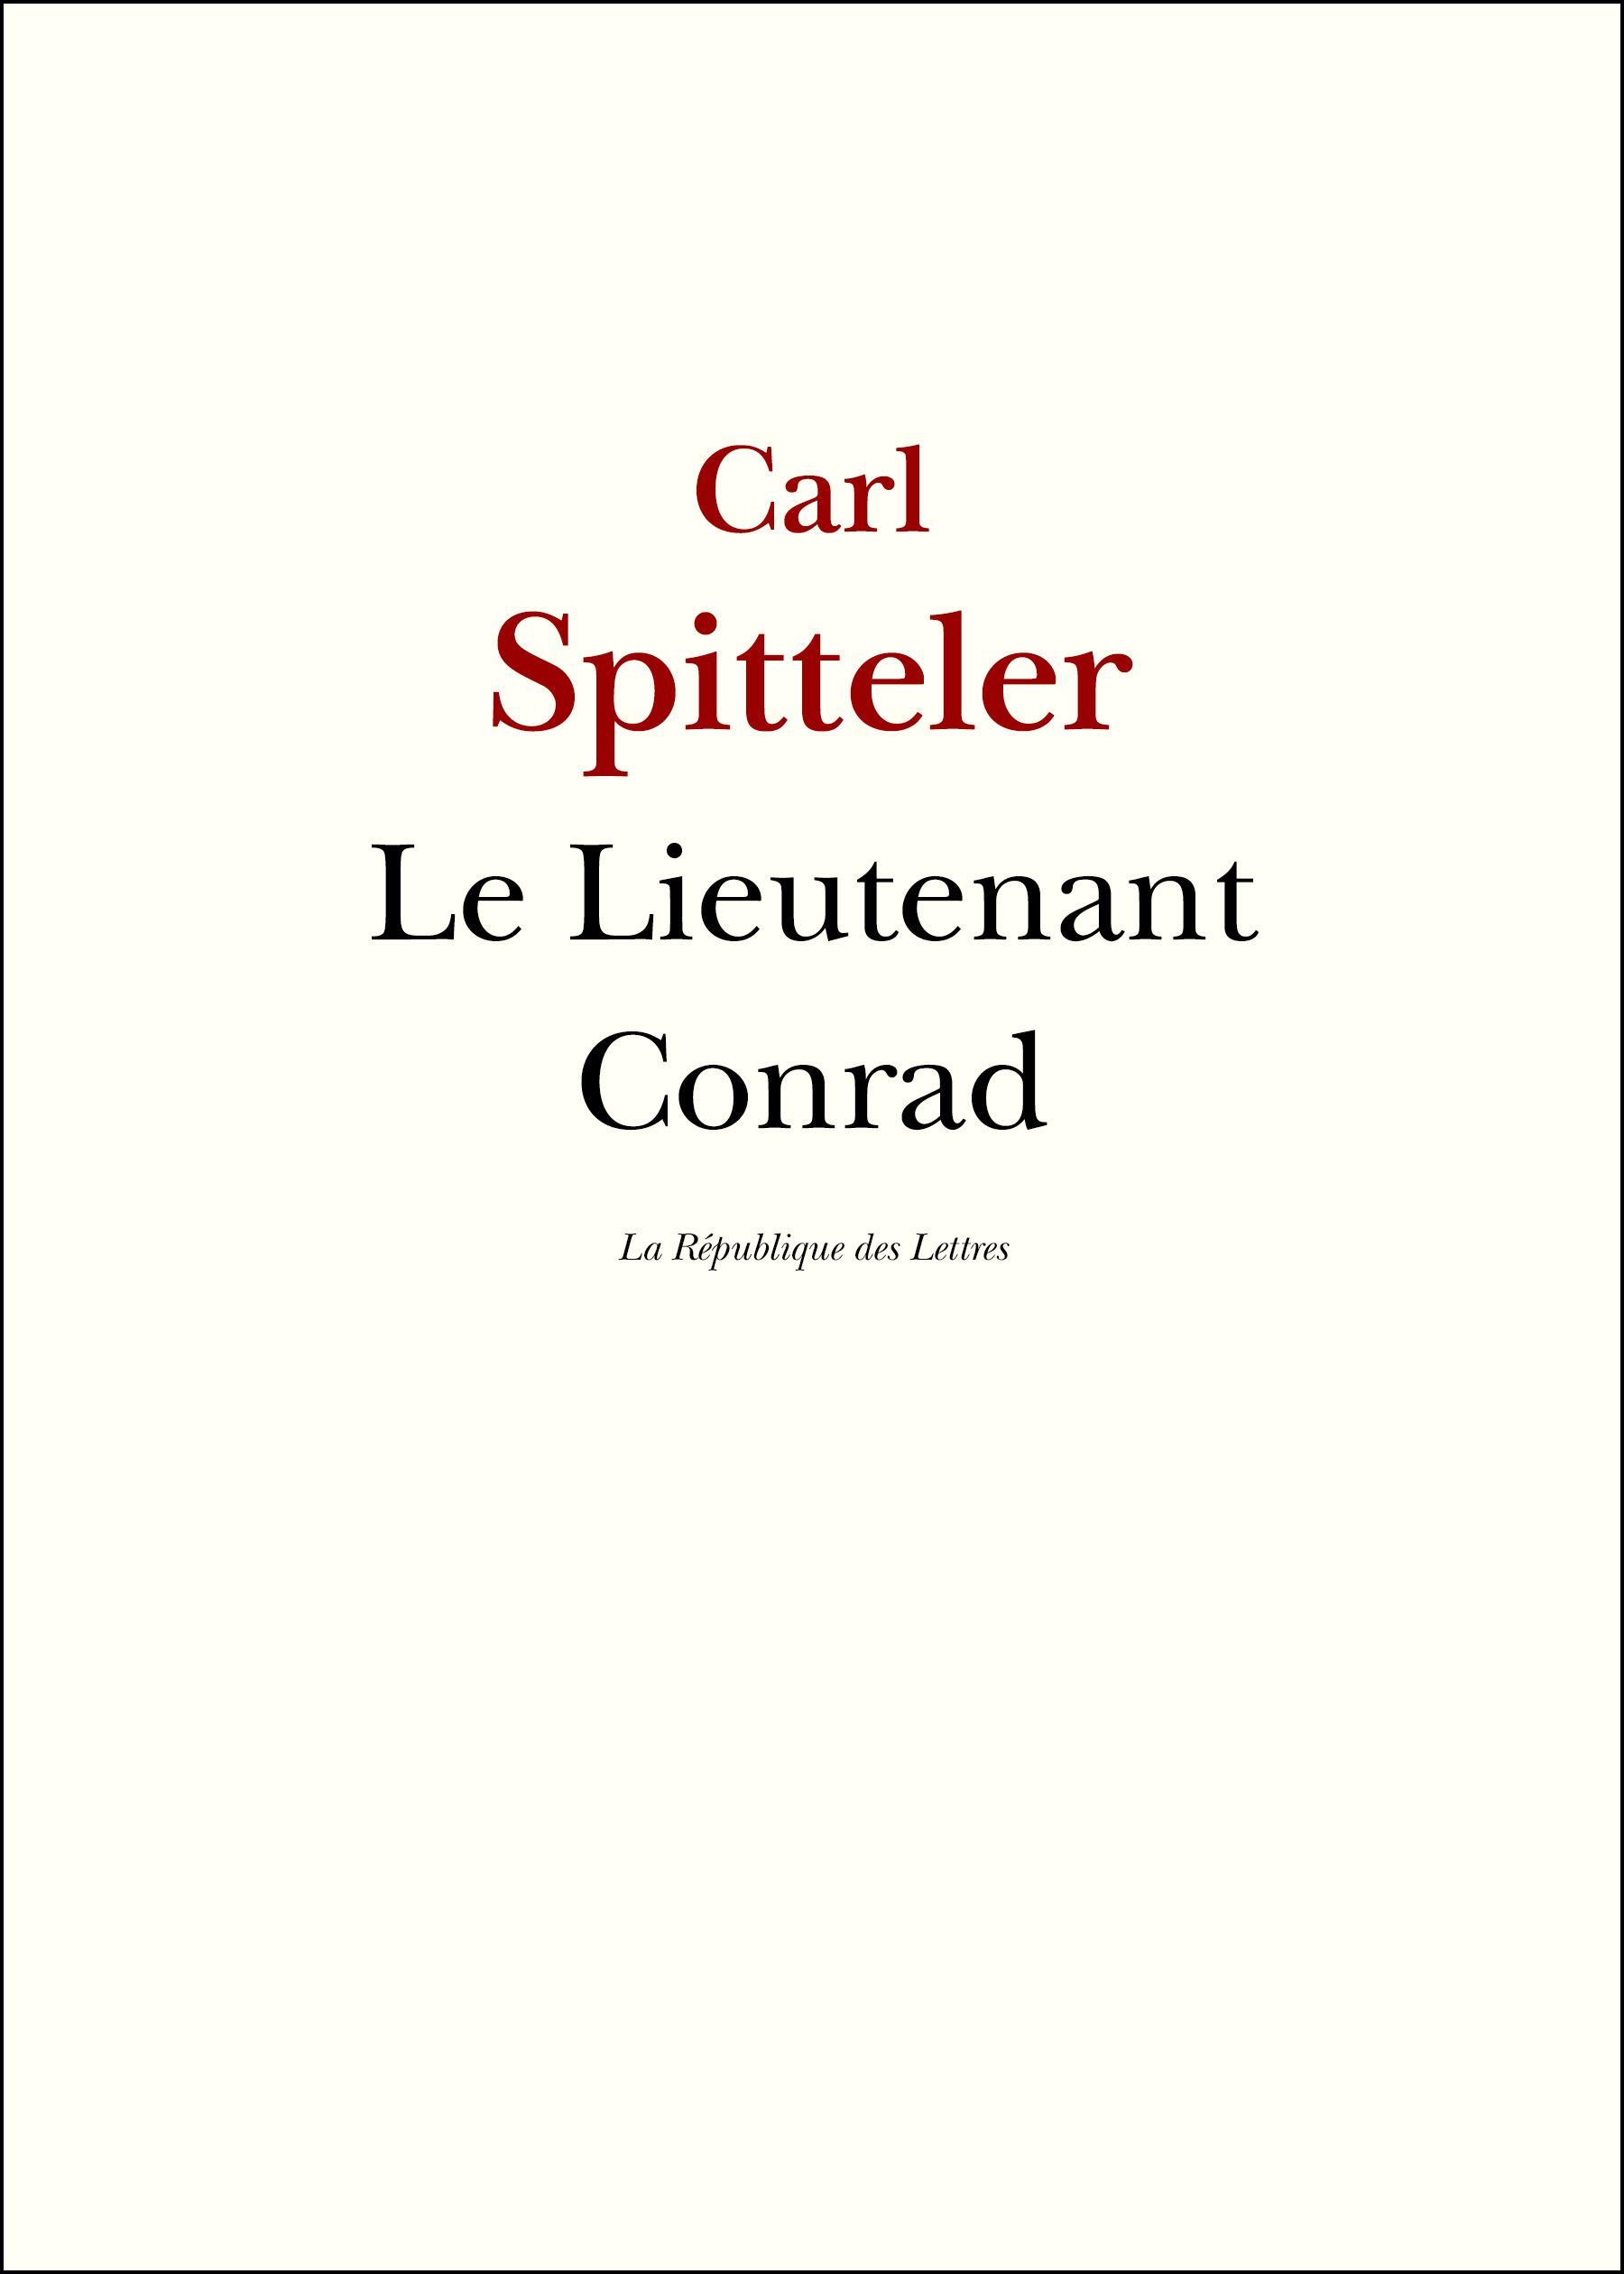 Le Lieutenant Conrad